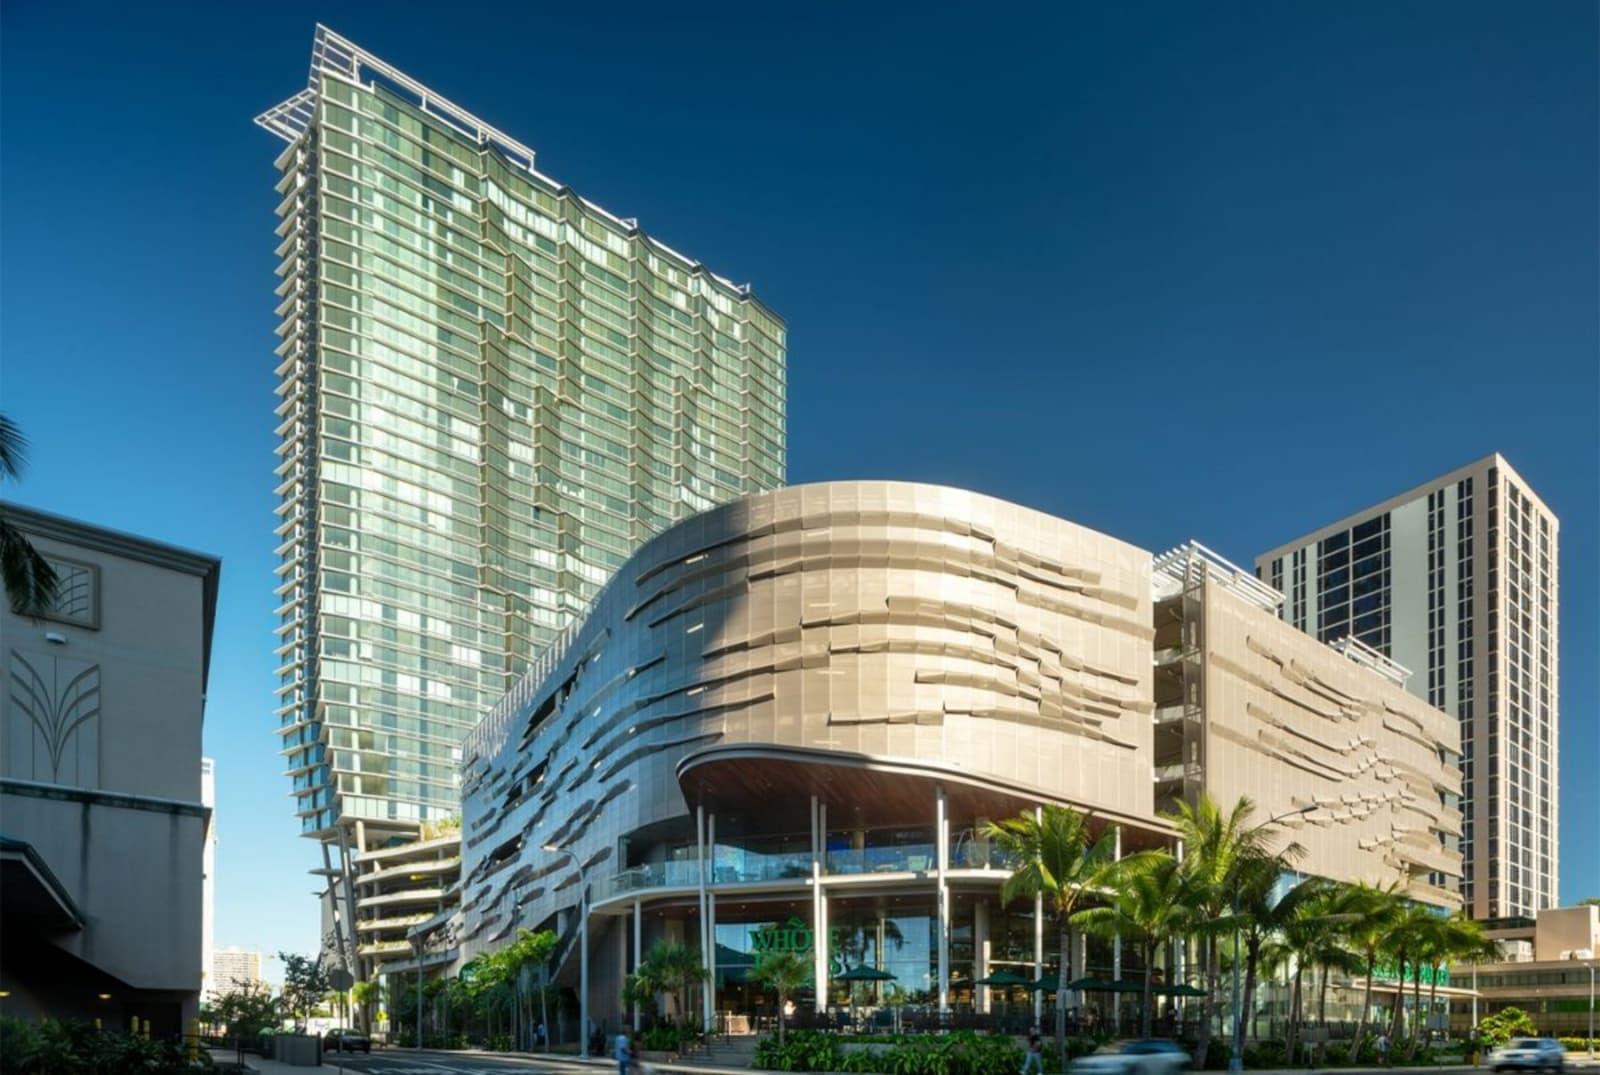 Aeo Building